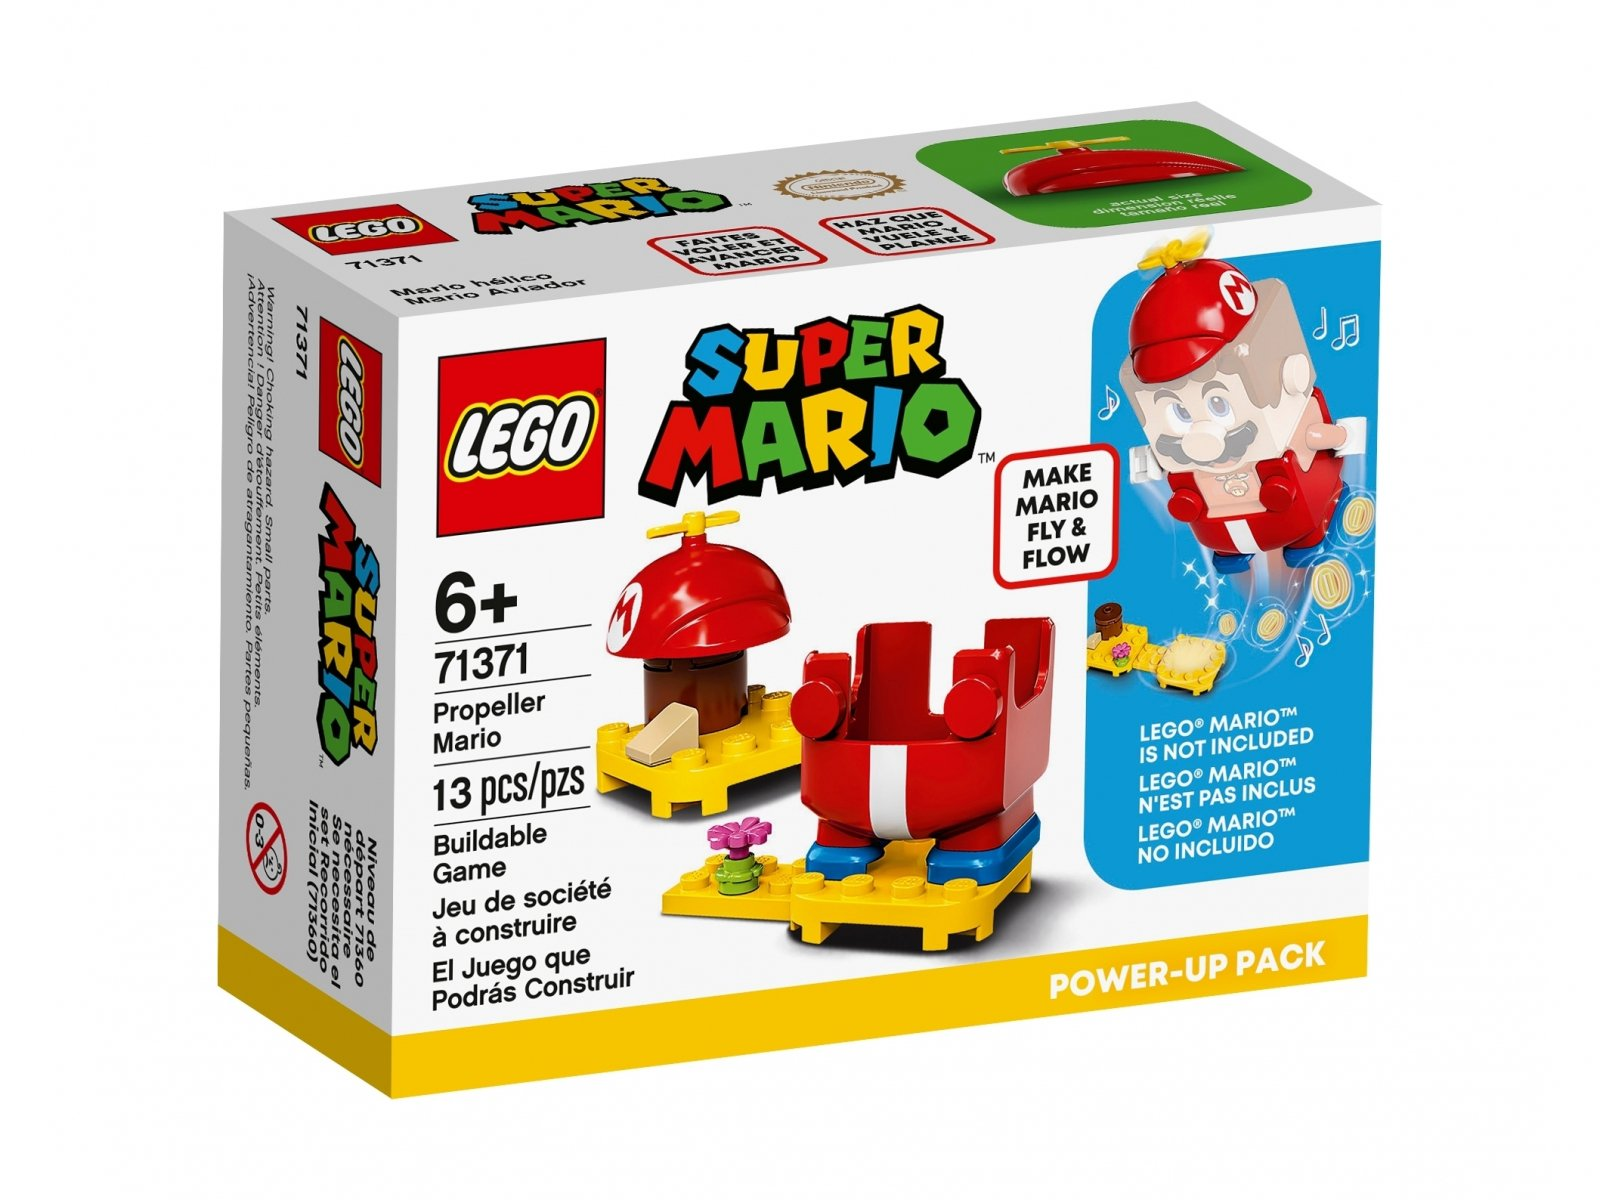 LEGO Super Mario™ 71371 Helikopterowy Mario - dodatek